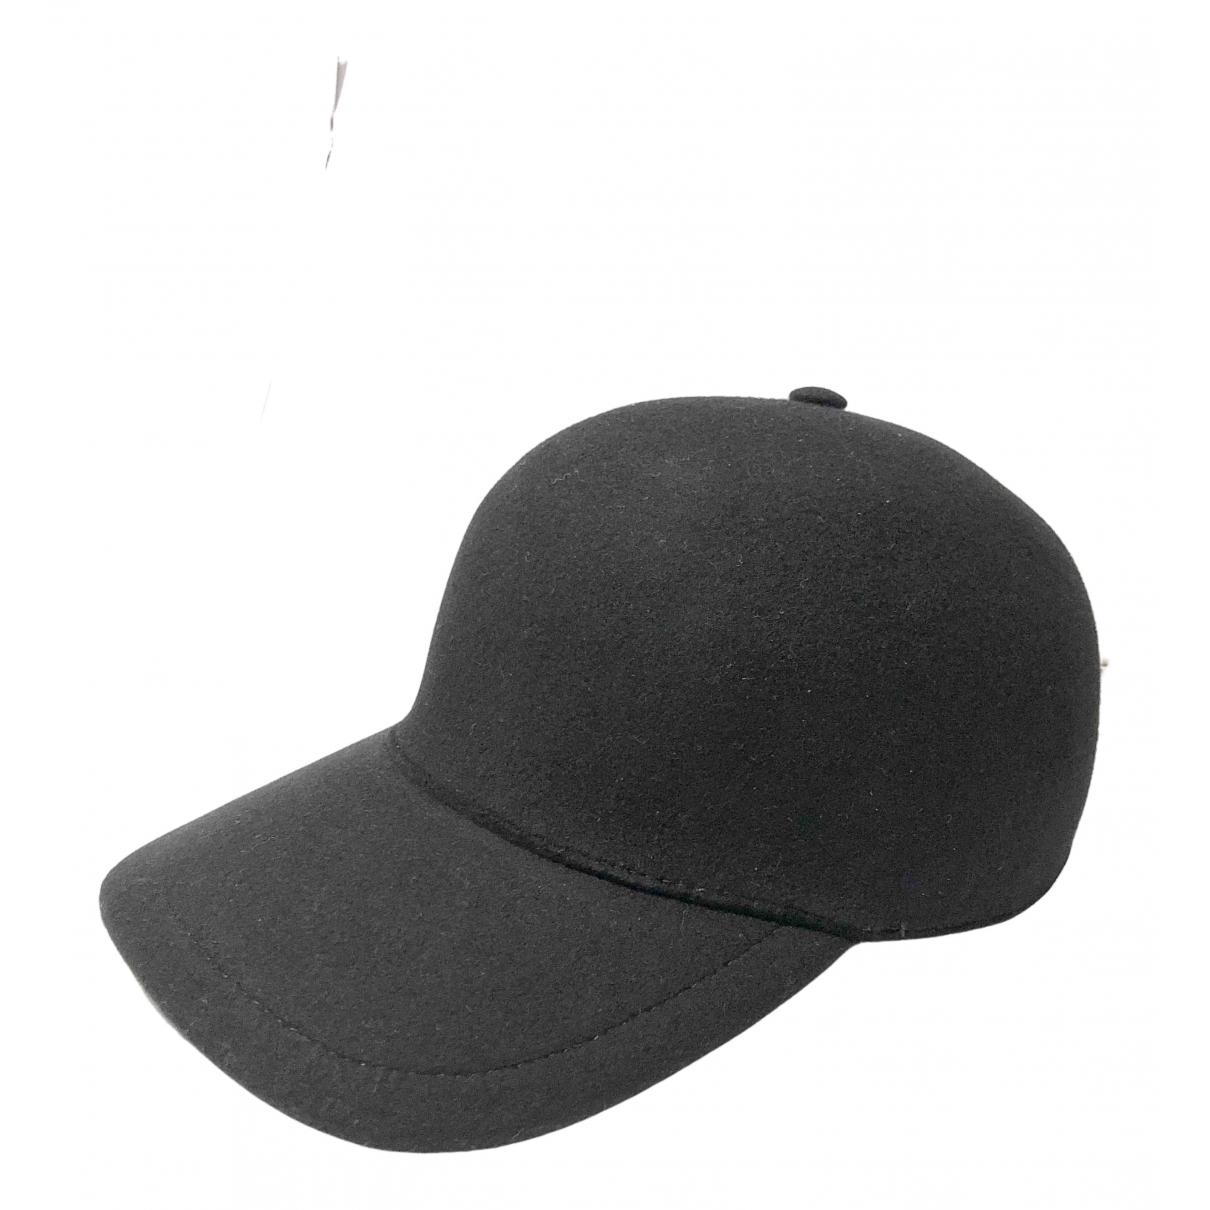 Burberry \N Black Wool hat for Women S International